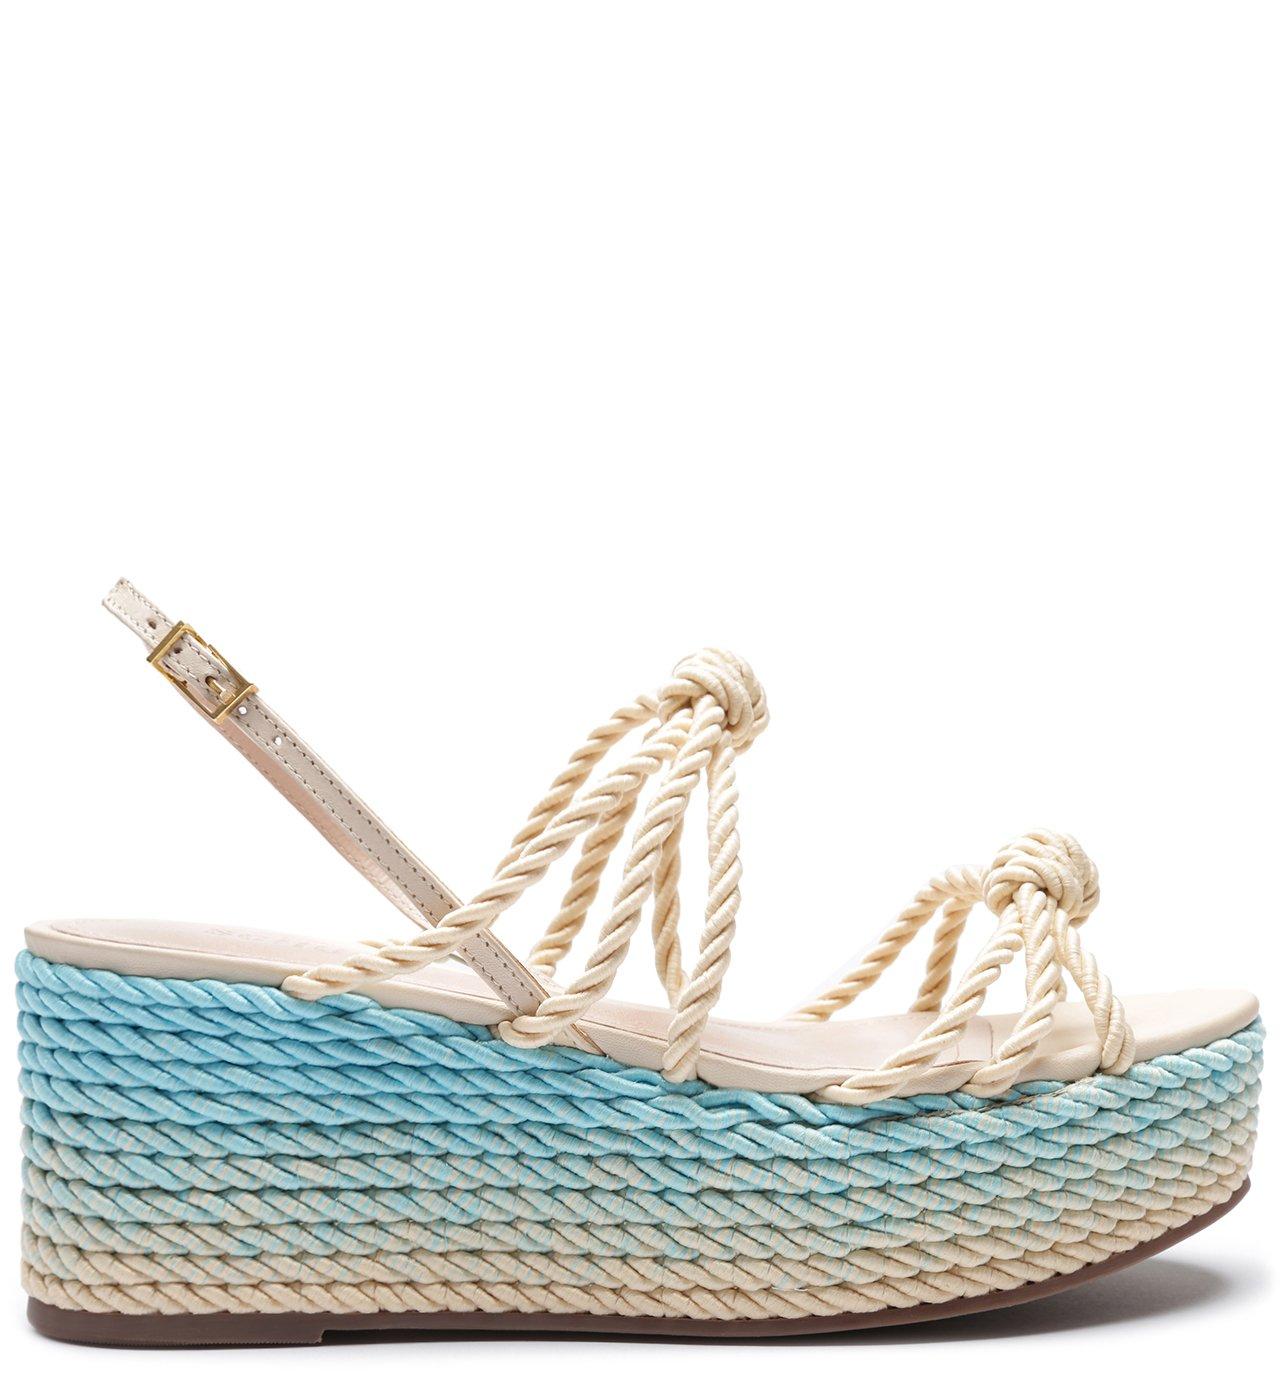 Sandália Flatform Tressê Tie-Dye Blue | Schutz